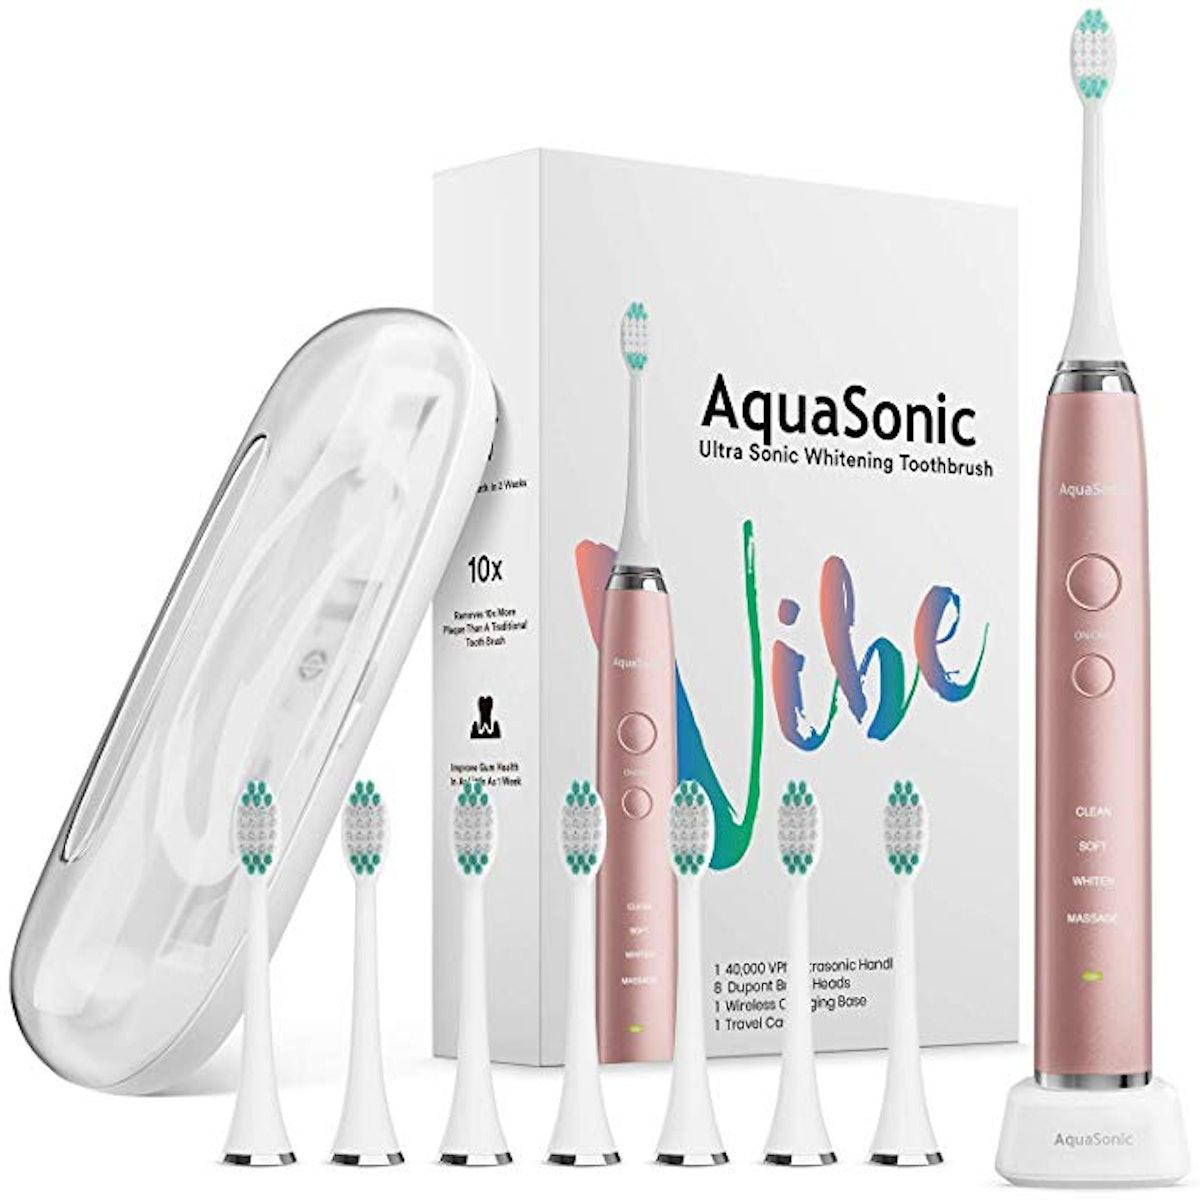 AquaSonic Ultra Whitening Electric Toothbrush